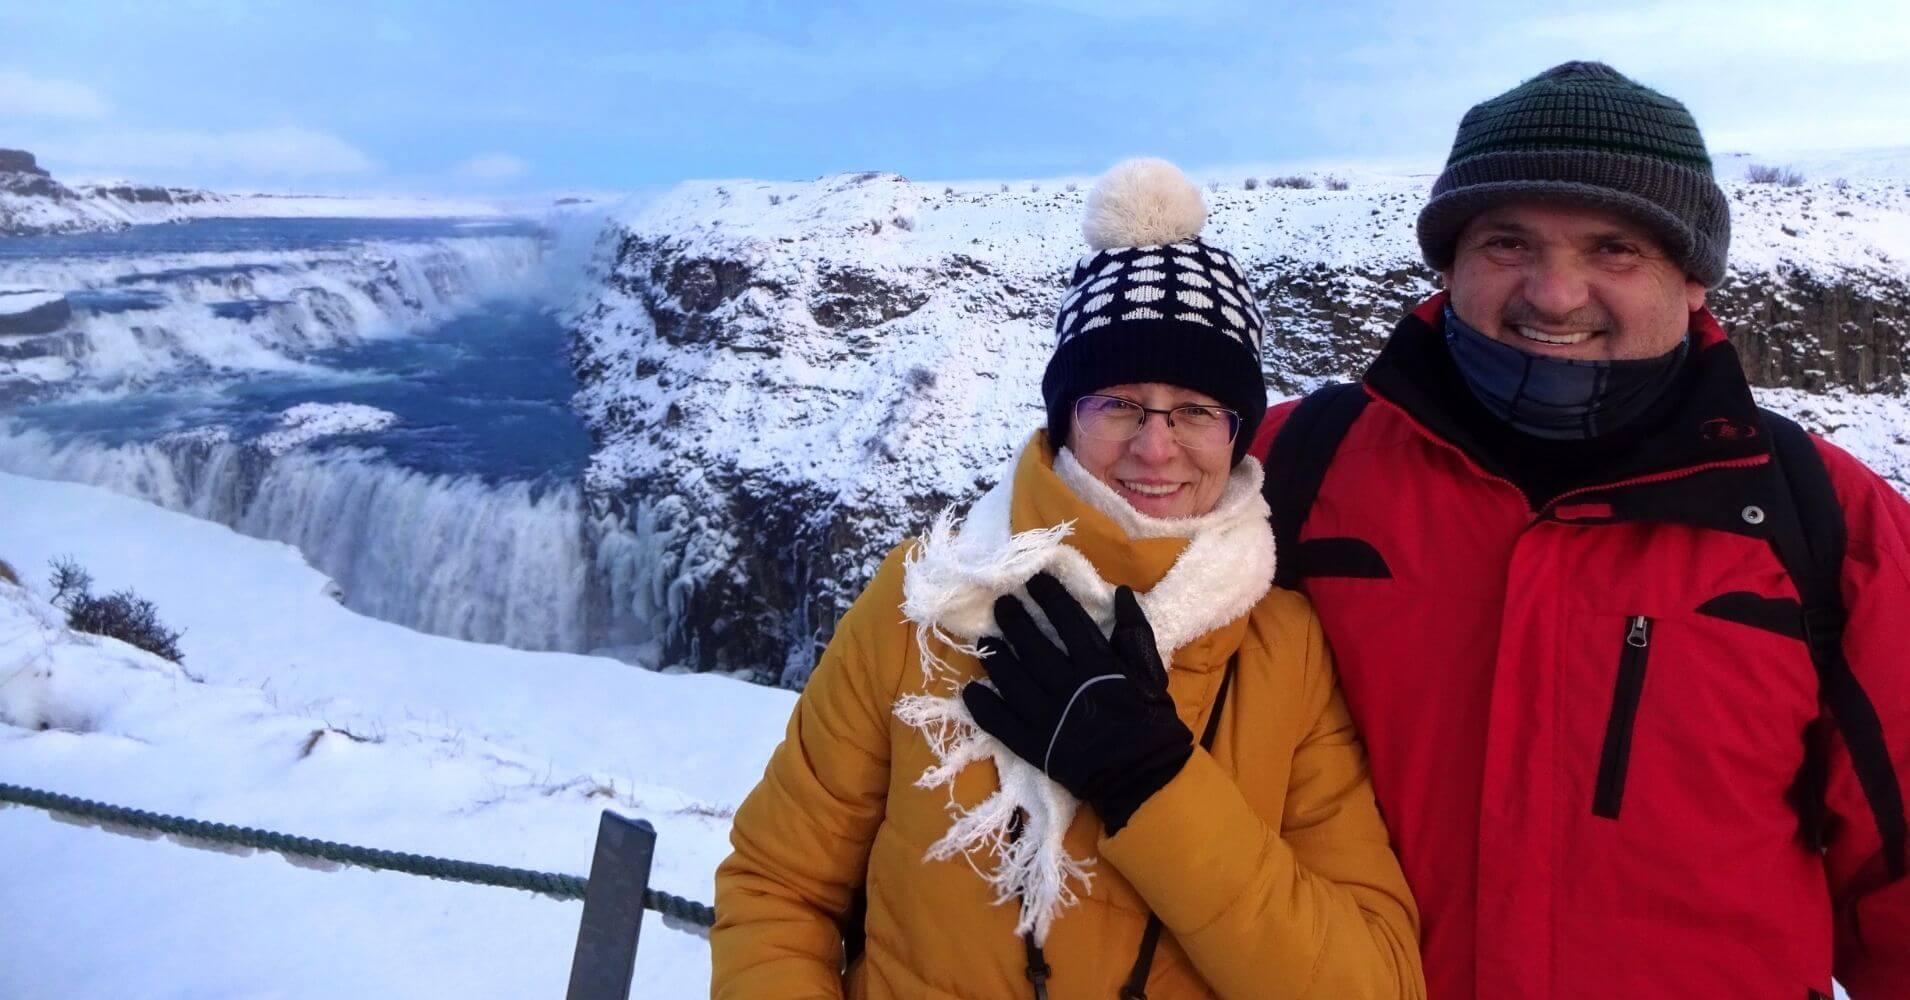 Cascada de Gulfoss. Viaje de Islandia en Invierno.